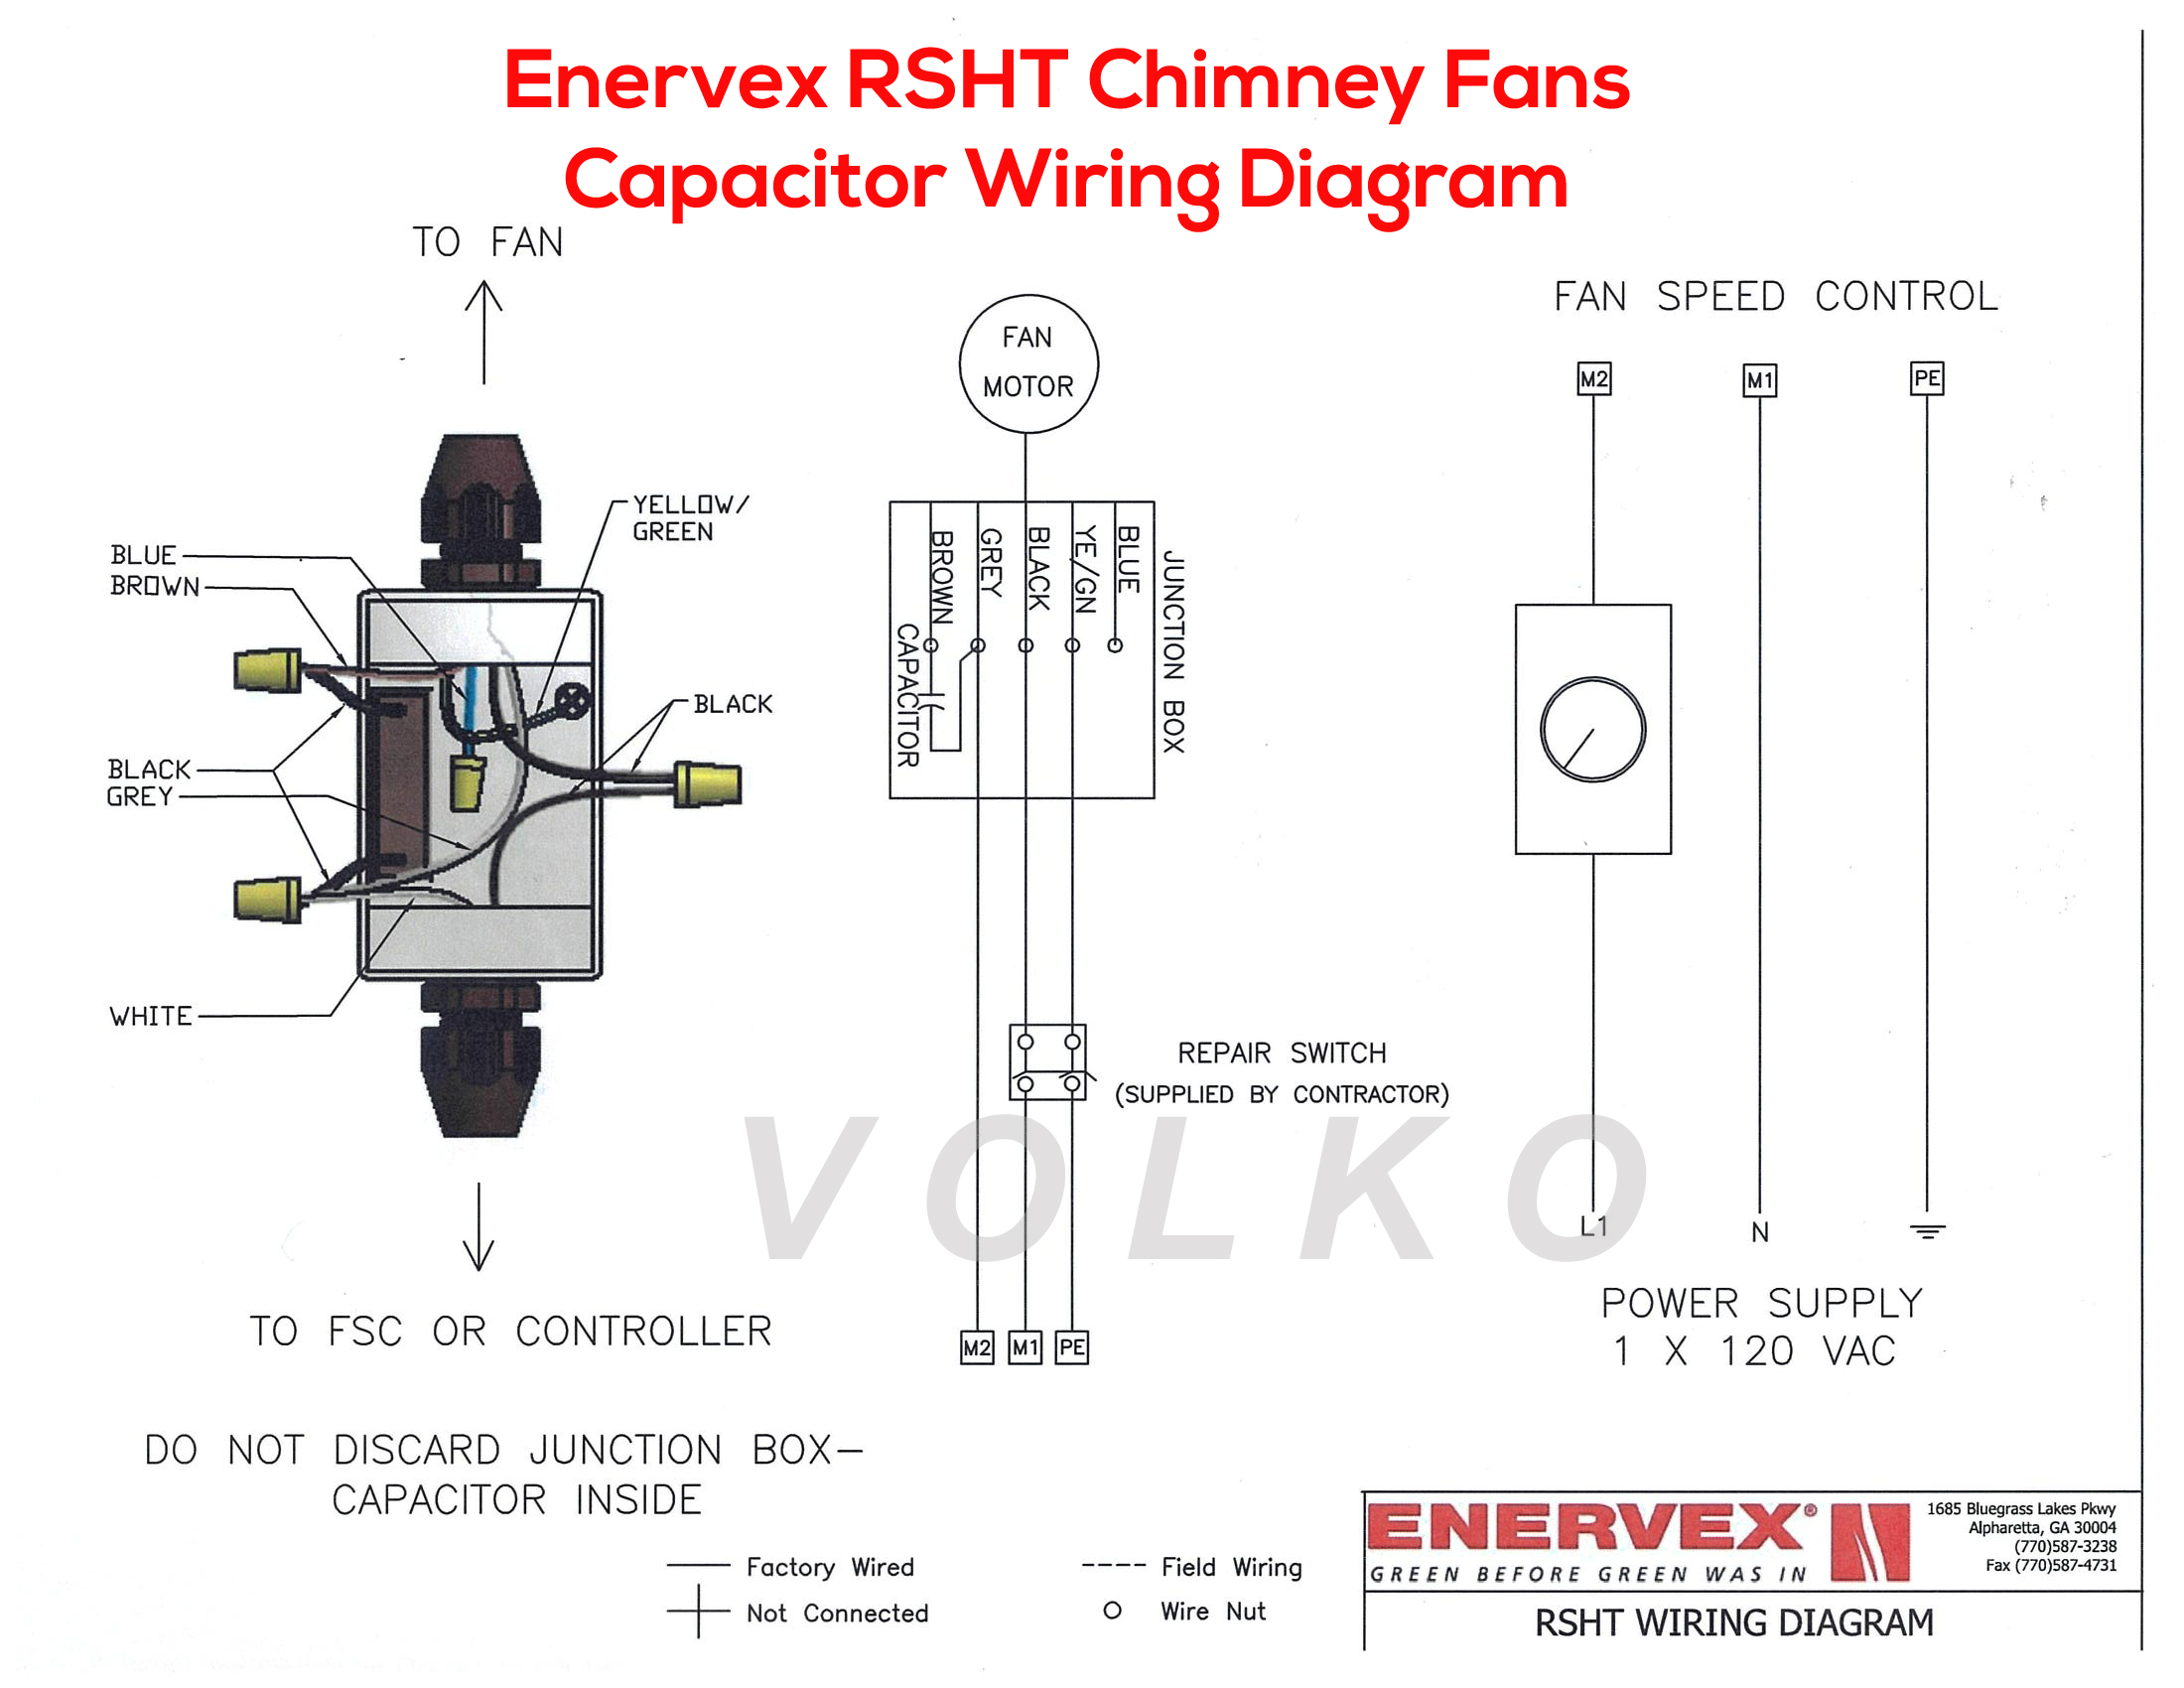 Citroen Cx 2200 Radiator Fan Switch Wiring - Wiring Diagram Recent  cream-adapter - cream-adapter.cosavedereanapoli.itcream-adapter.cosavedereanapoli.it